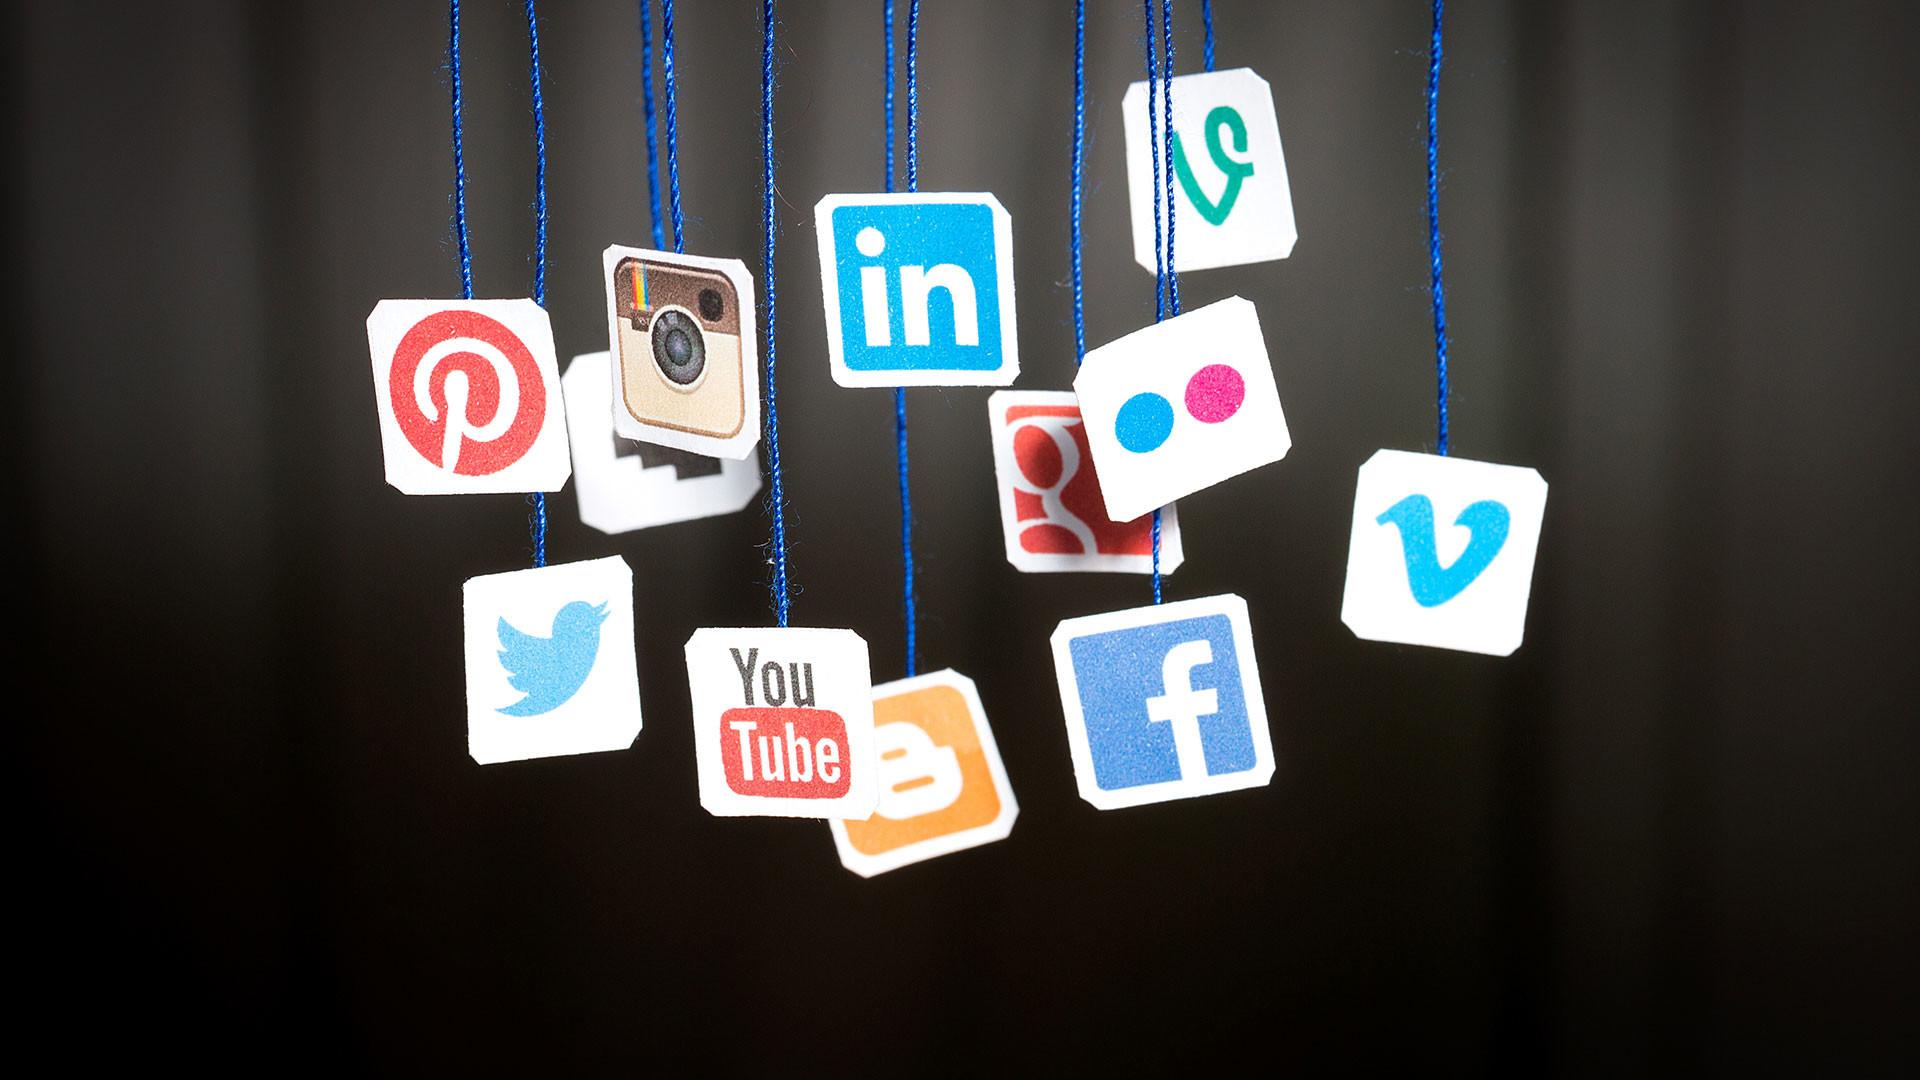 hd pics photos stunning attractive social media 12 hd desktop background  wallpaper